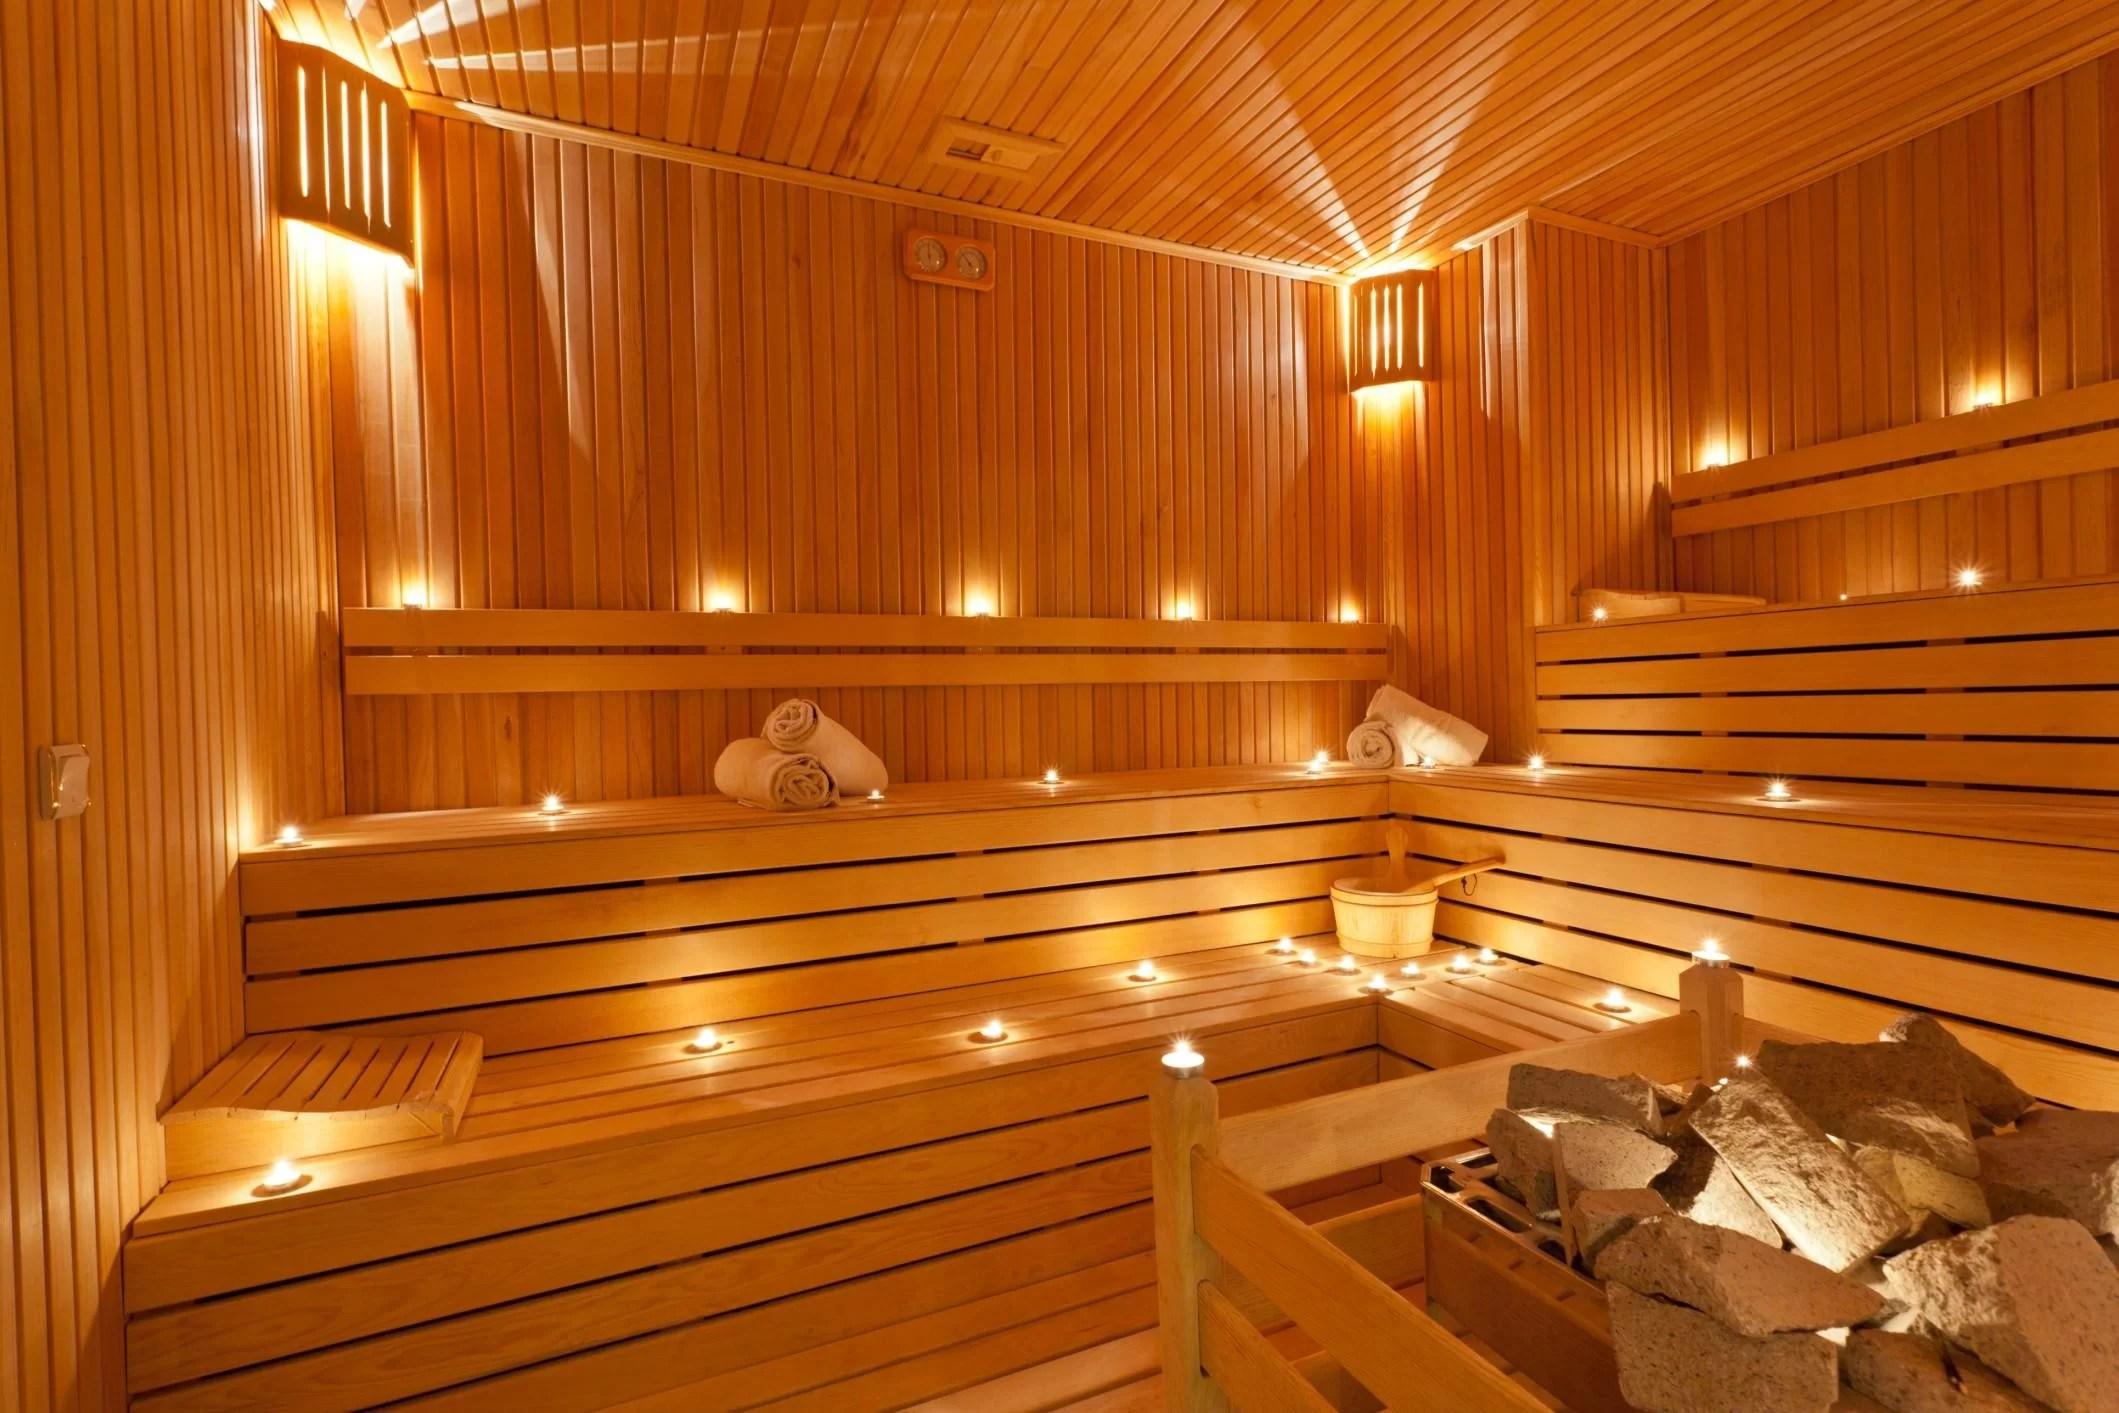 Sauna E Bagno Turco Veneto